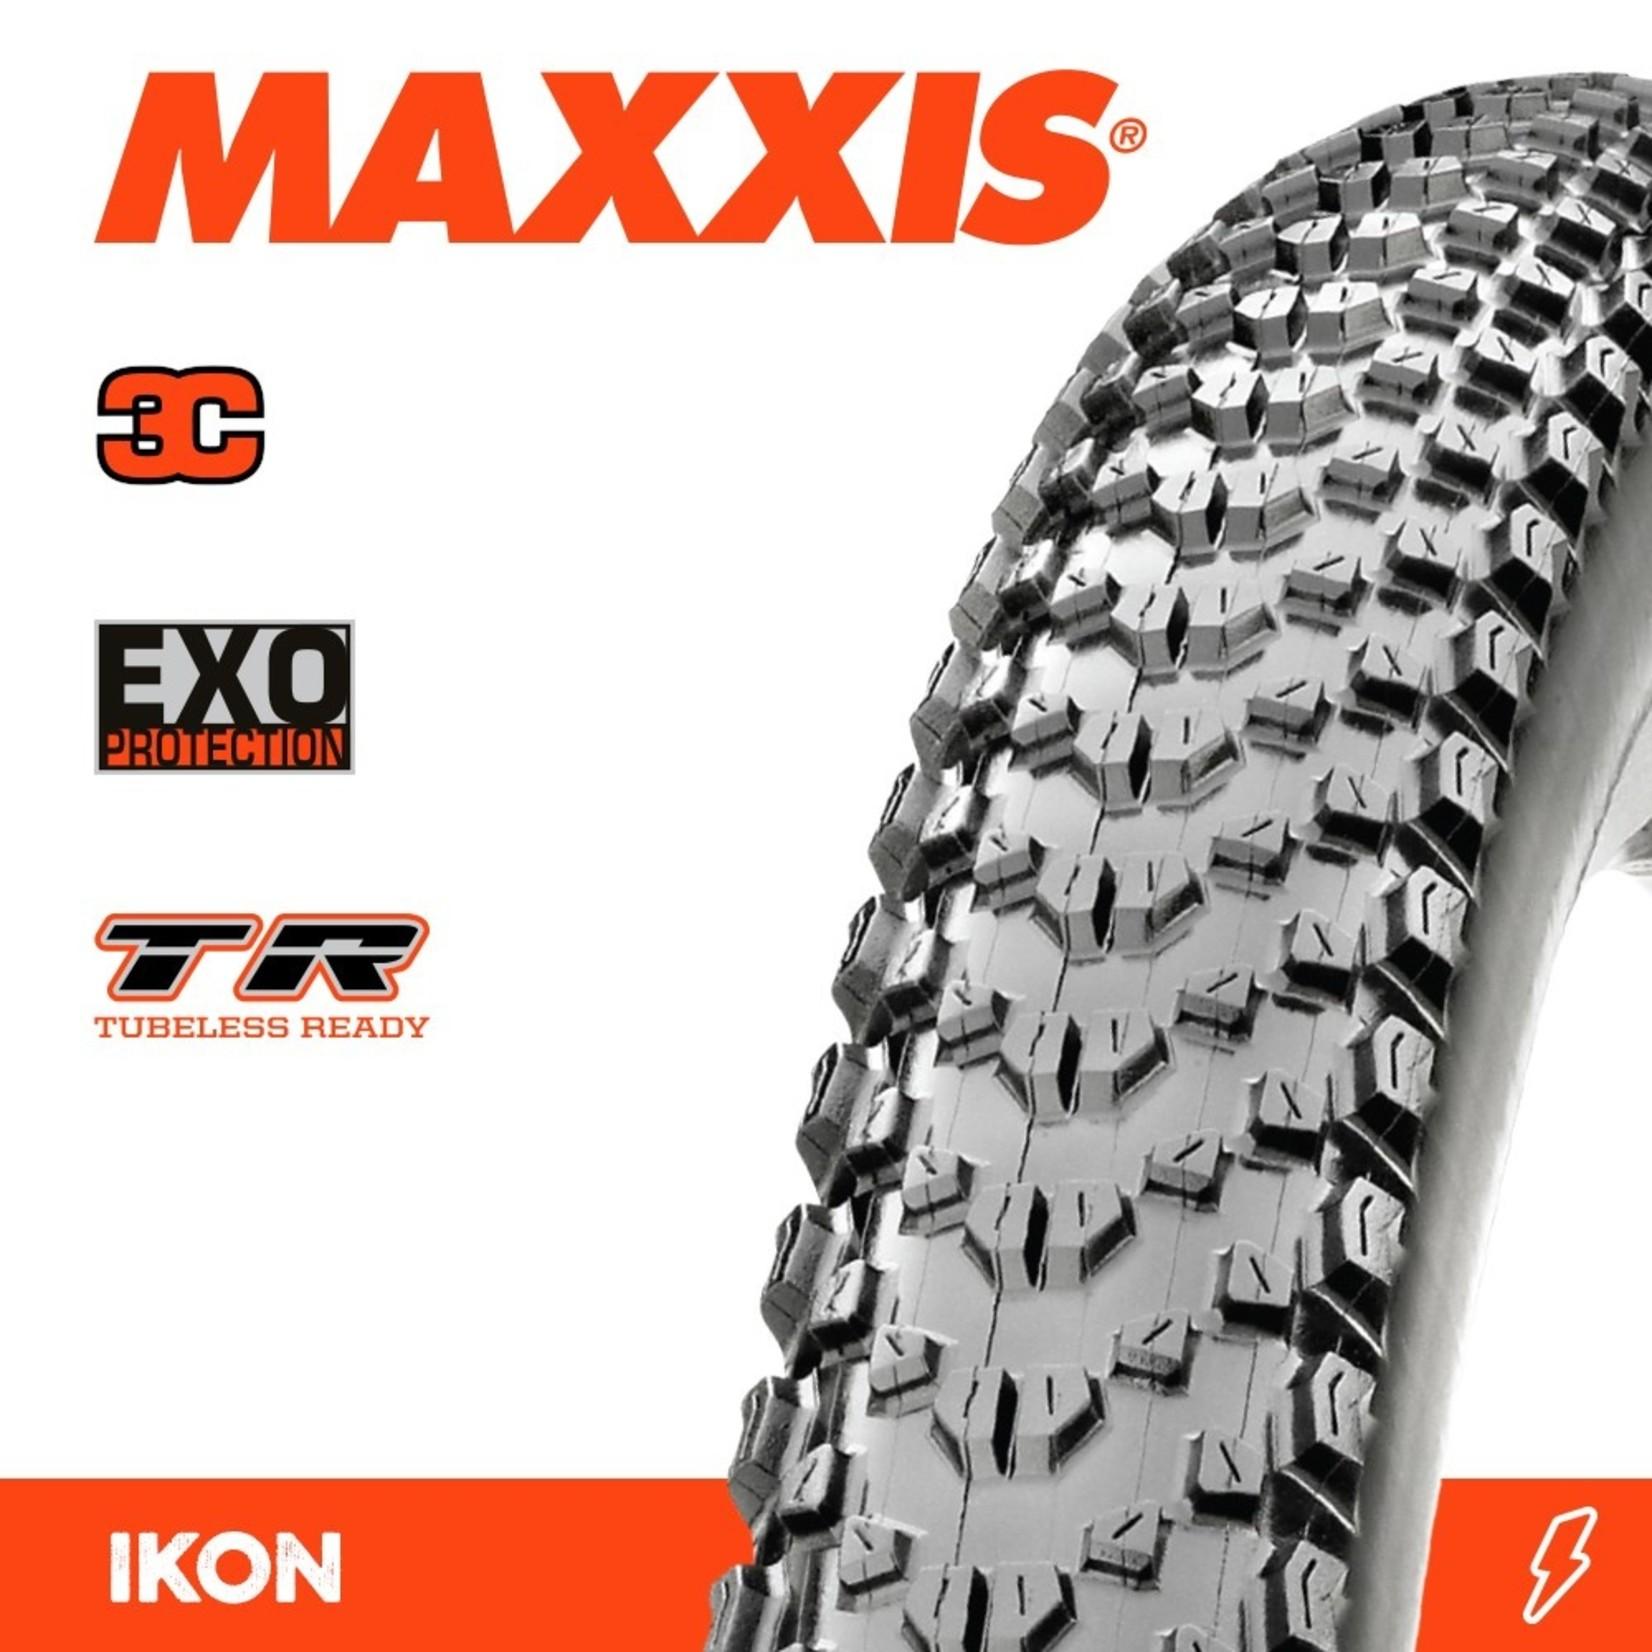 Maxxis Maxxis, Tyre Ikon 27.5x2.20 3C Speed EXO TR 120TPI Black